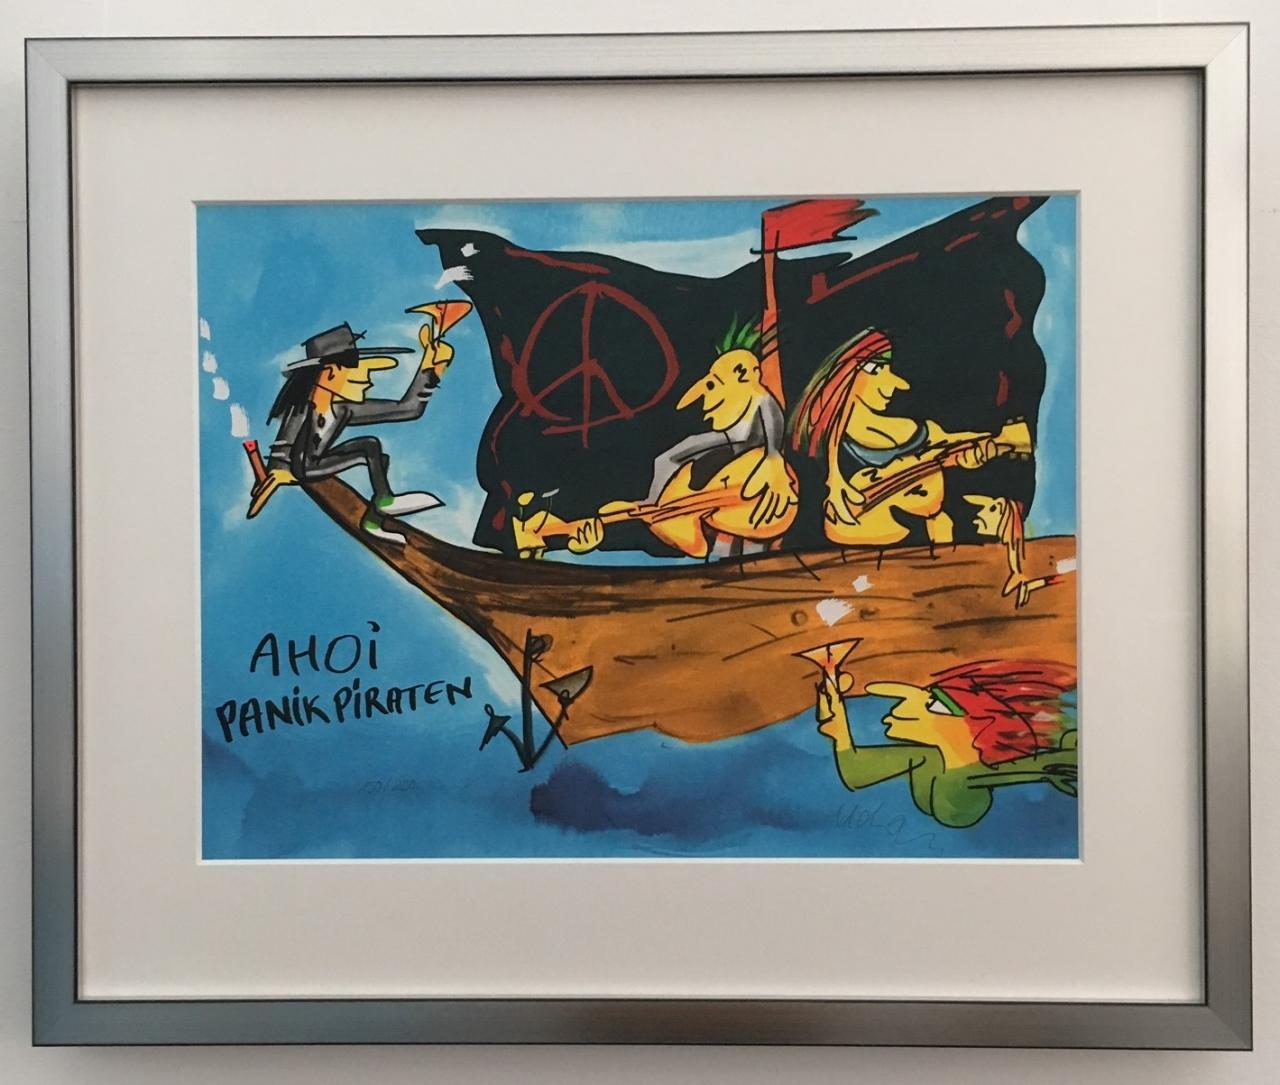 Ahoi Panik Piraten gerahmt